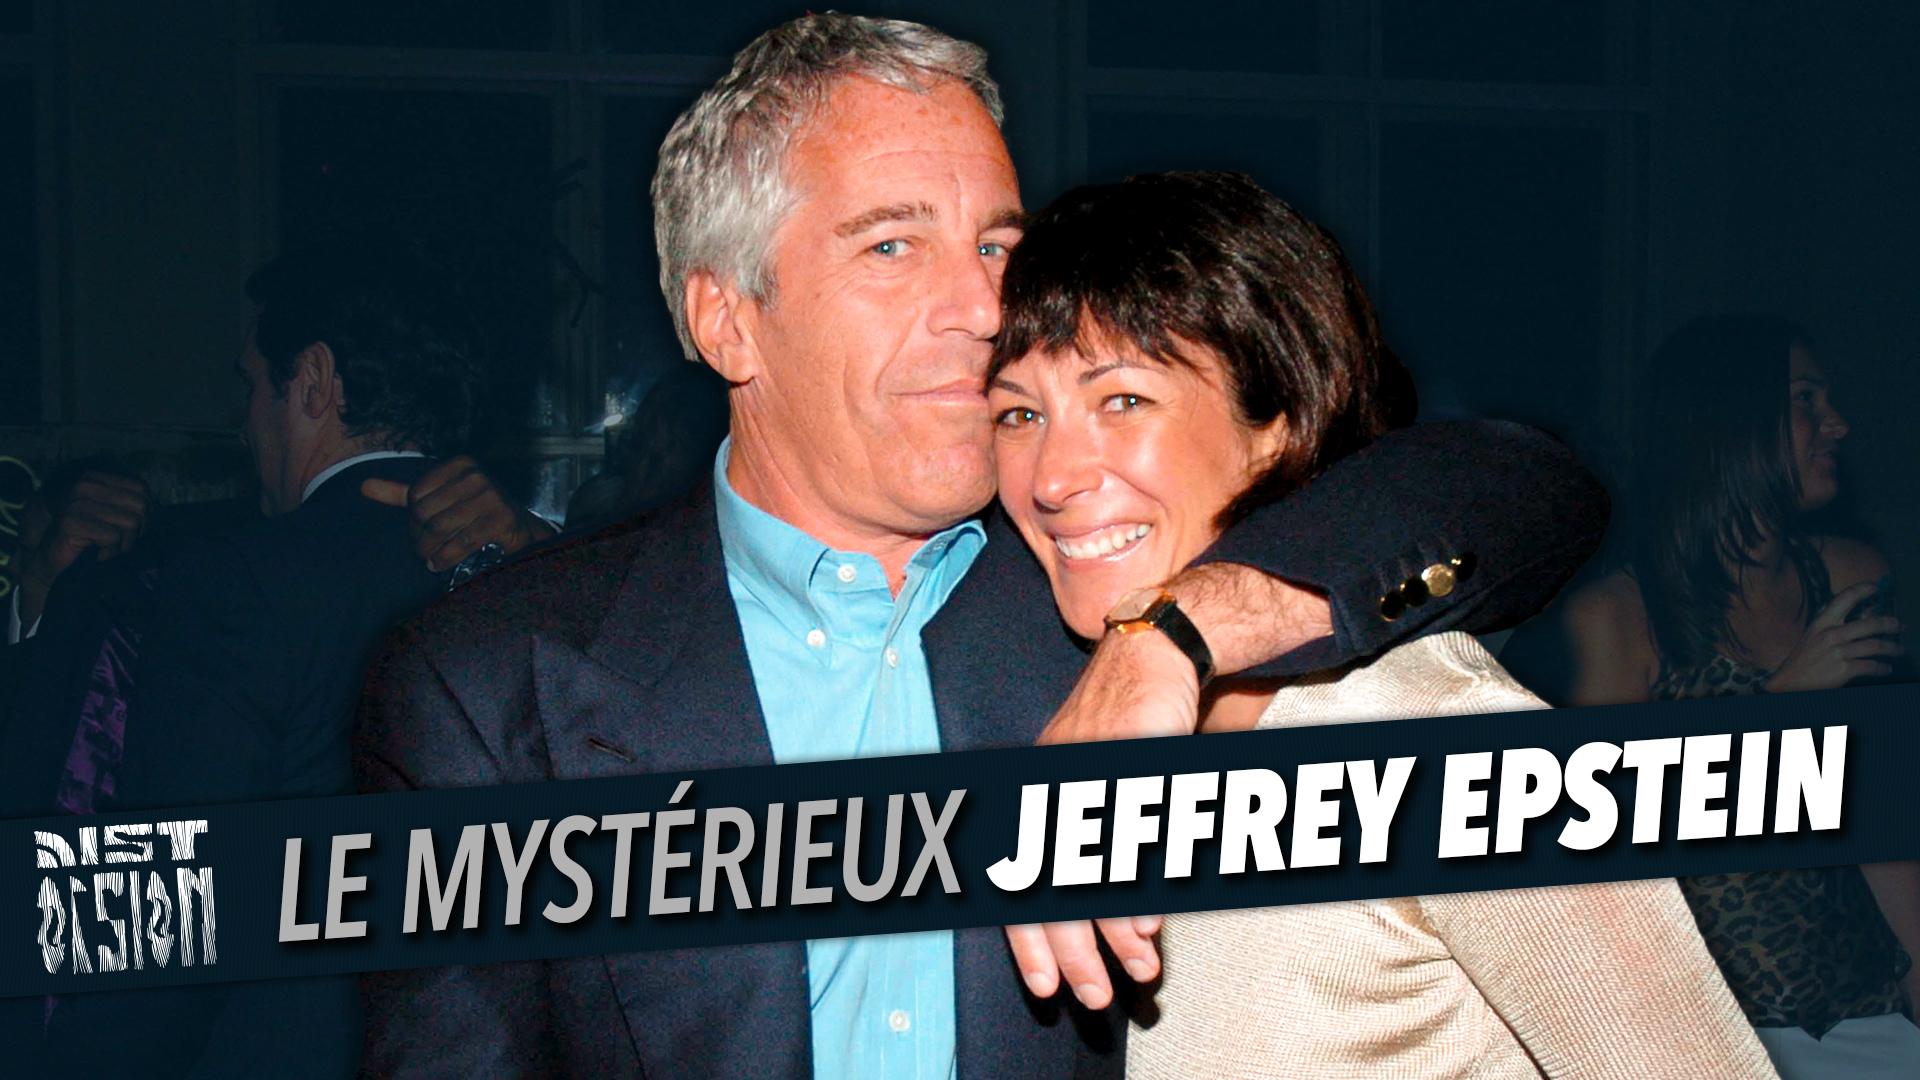 #69 - Le mystérieux Jeffrey Epstein